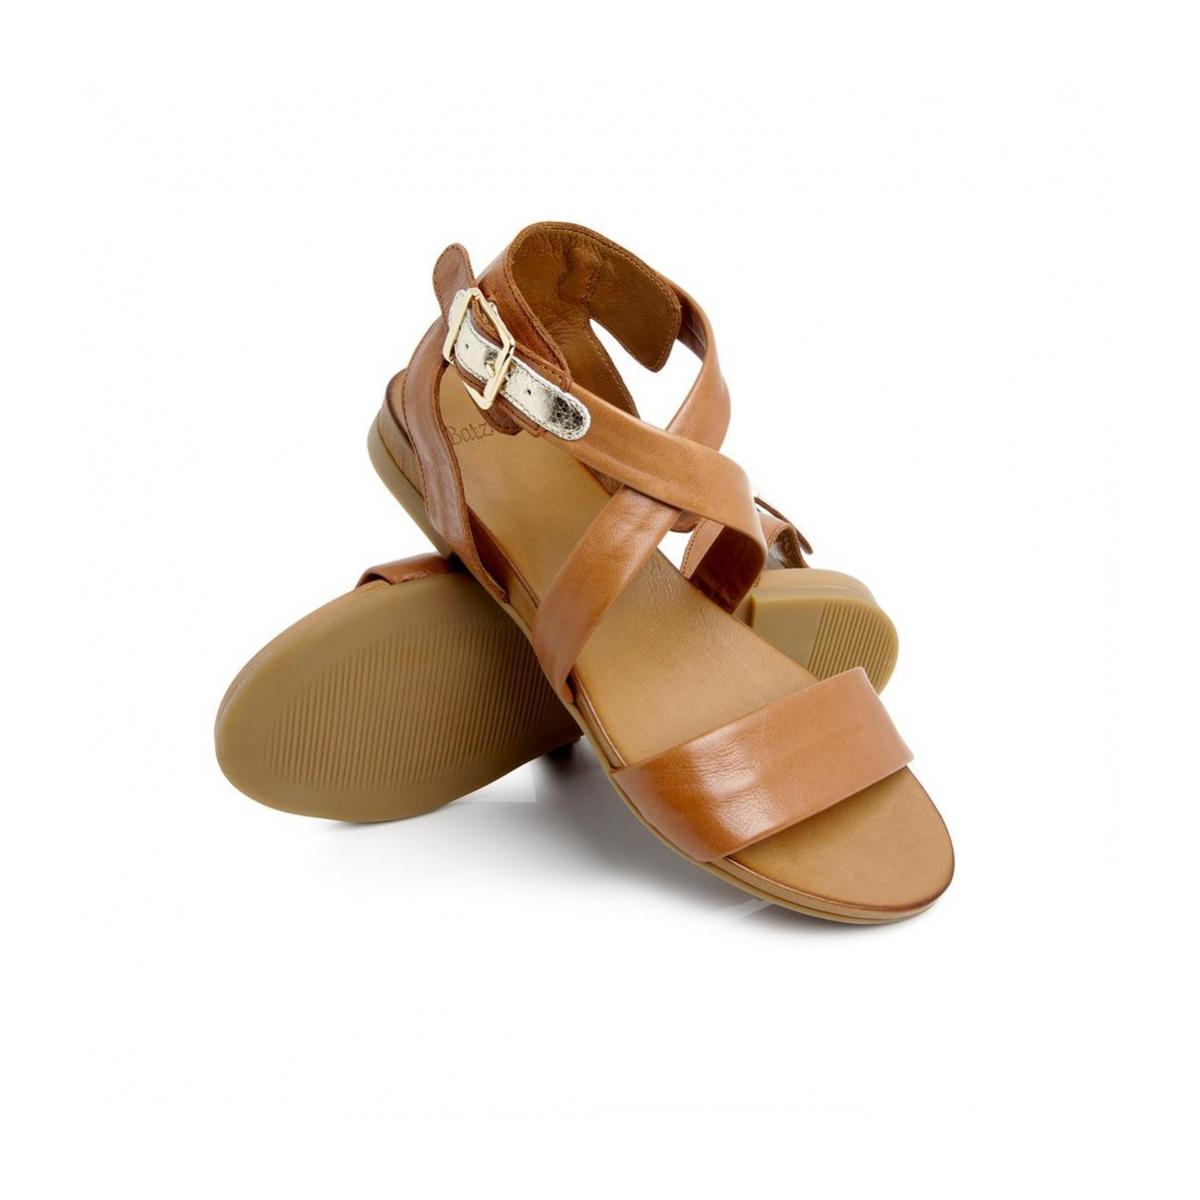 bfc9d1b050 Dámske kožené hnedé sandále FRESH 51 - 4